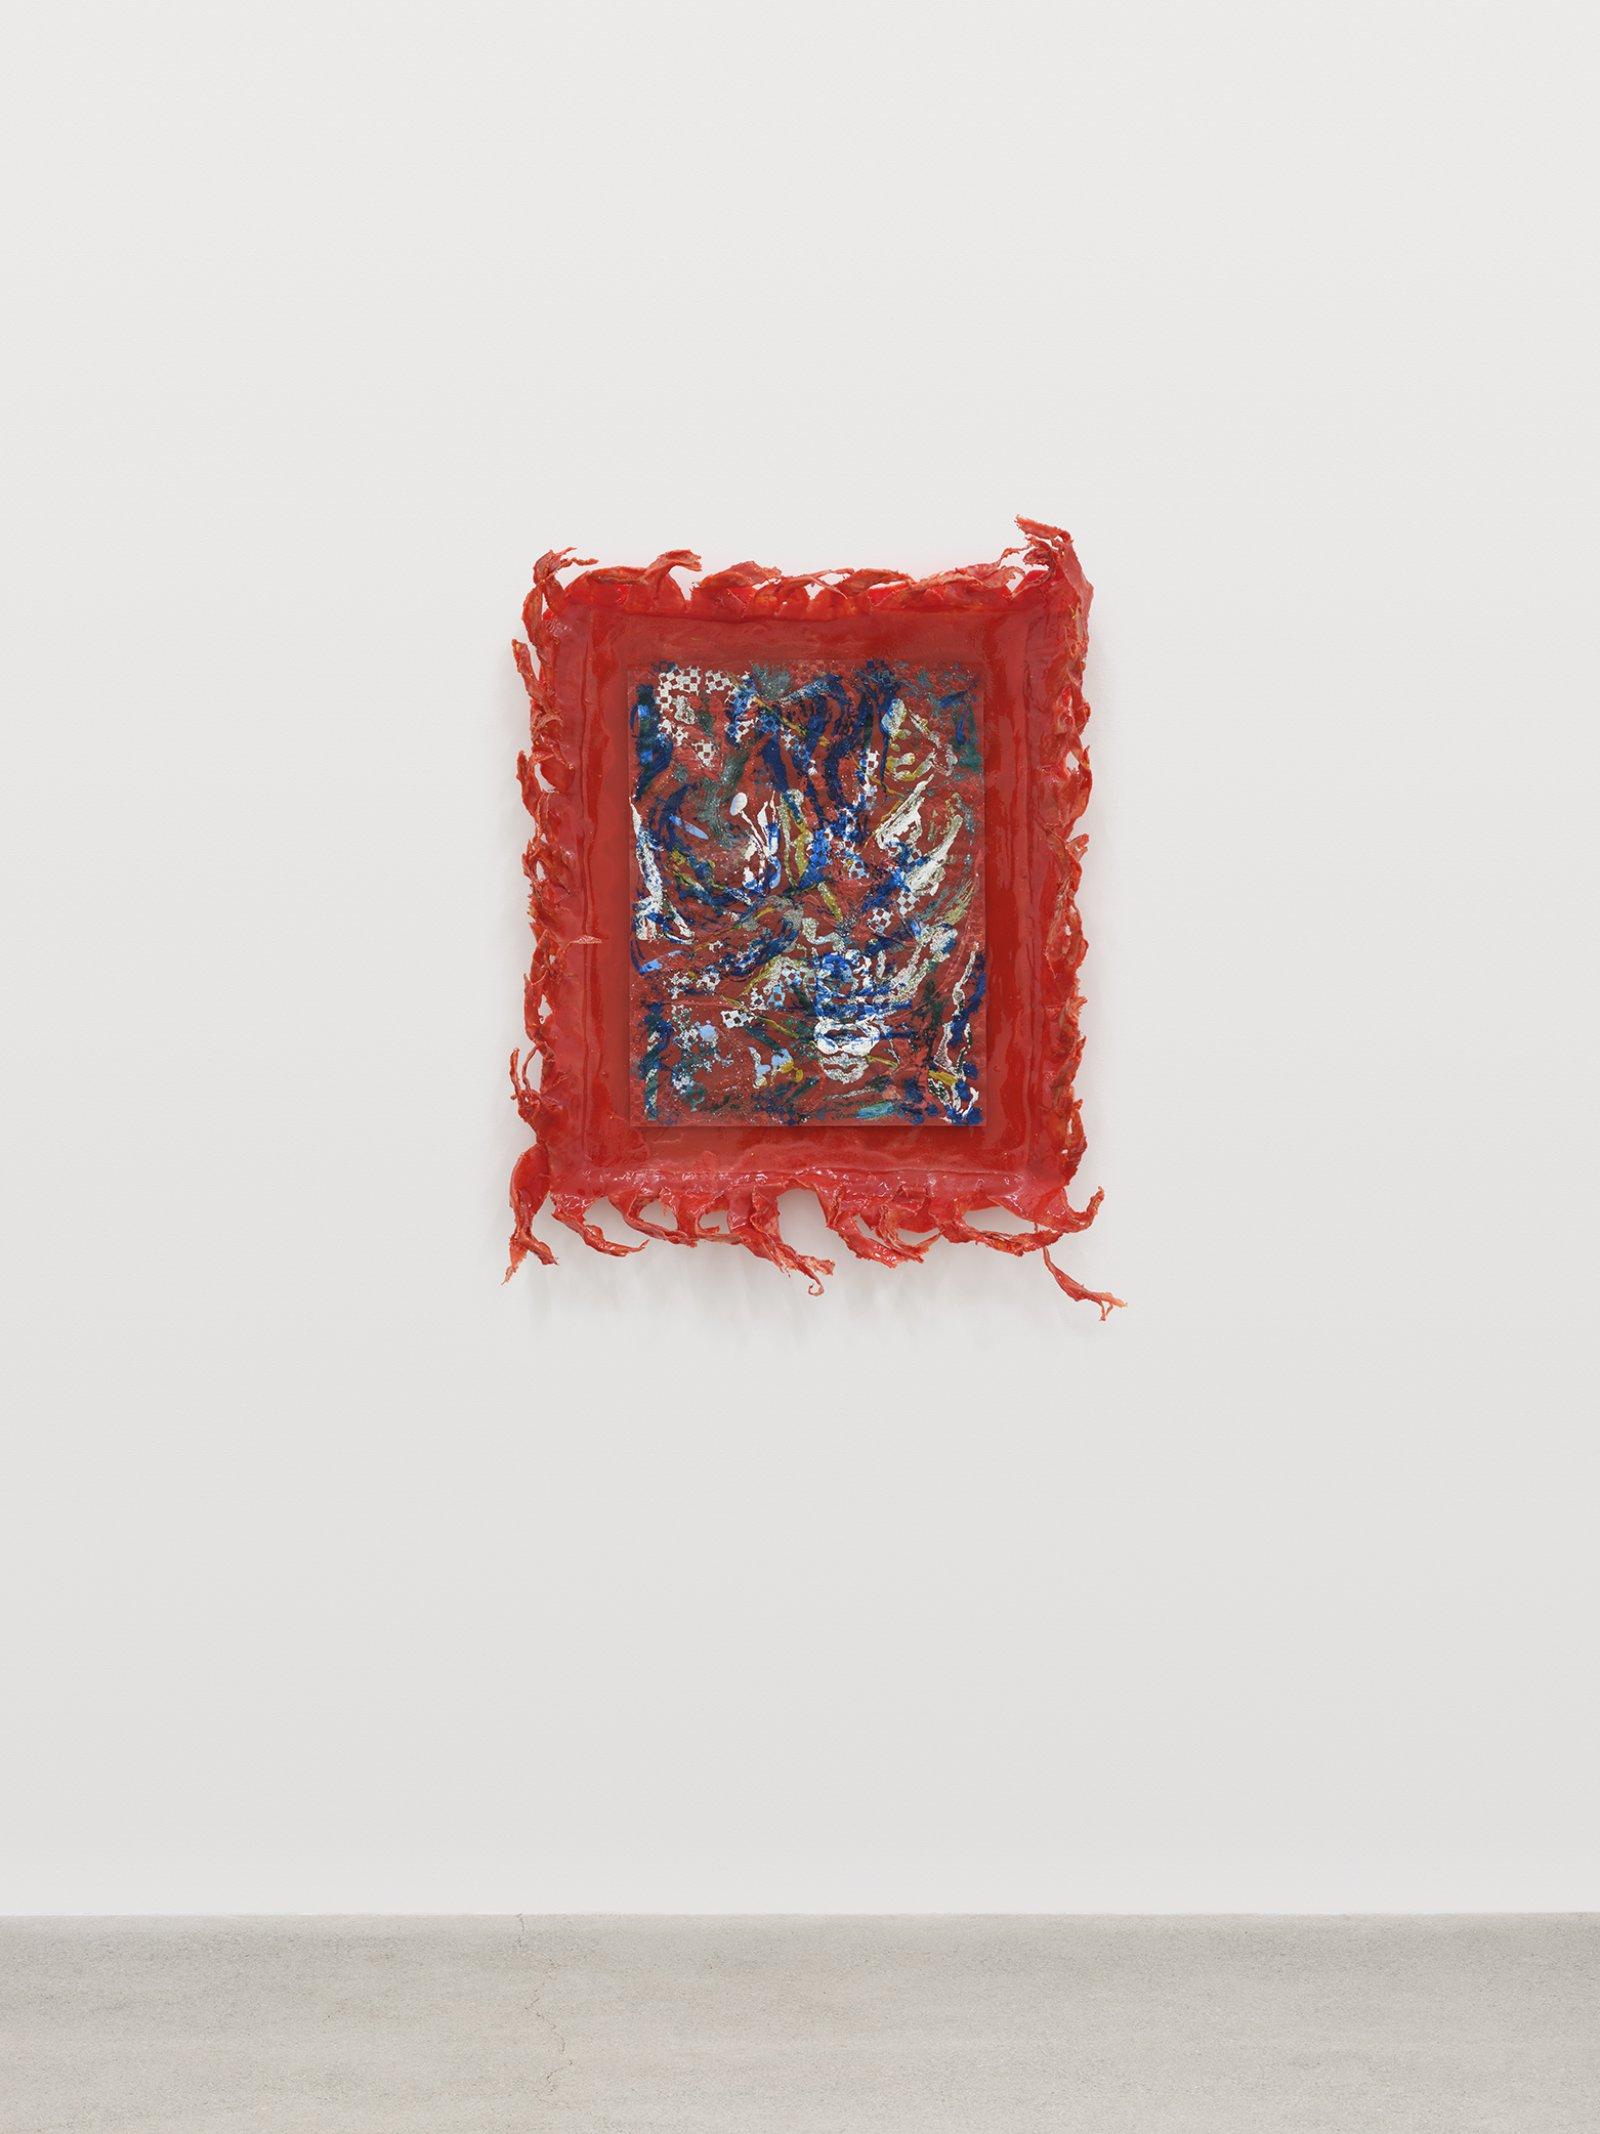 Rebecca Brewer, Live Resin: Rotten, 2020, urethane resin, plexiglas, embossing powder on vellum, 35 x 28 x 5 in. (89 x 71 x 13 cm)